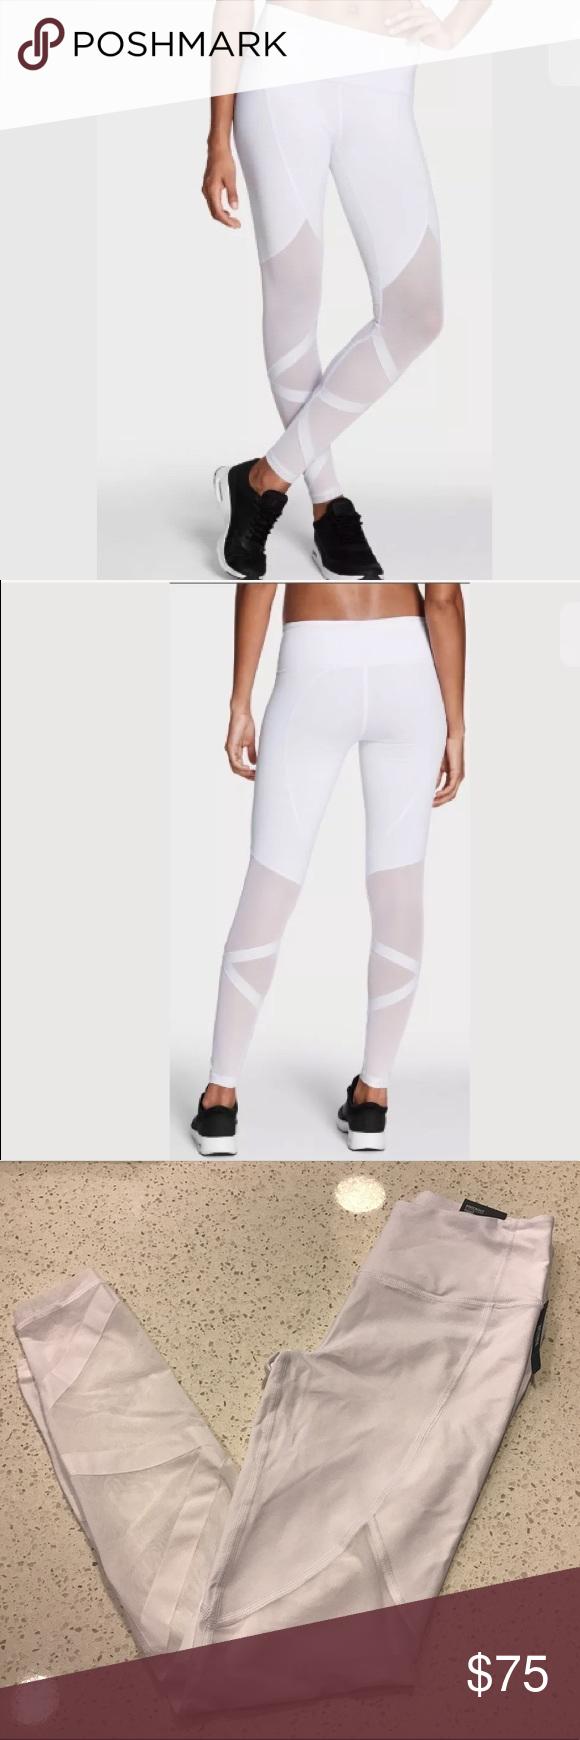 128acfabdc0a1 Vs Victoria's Secret Sport Knockout white legging .:DESCRIPTION:. BRAND NEW  WITH TAGS